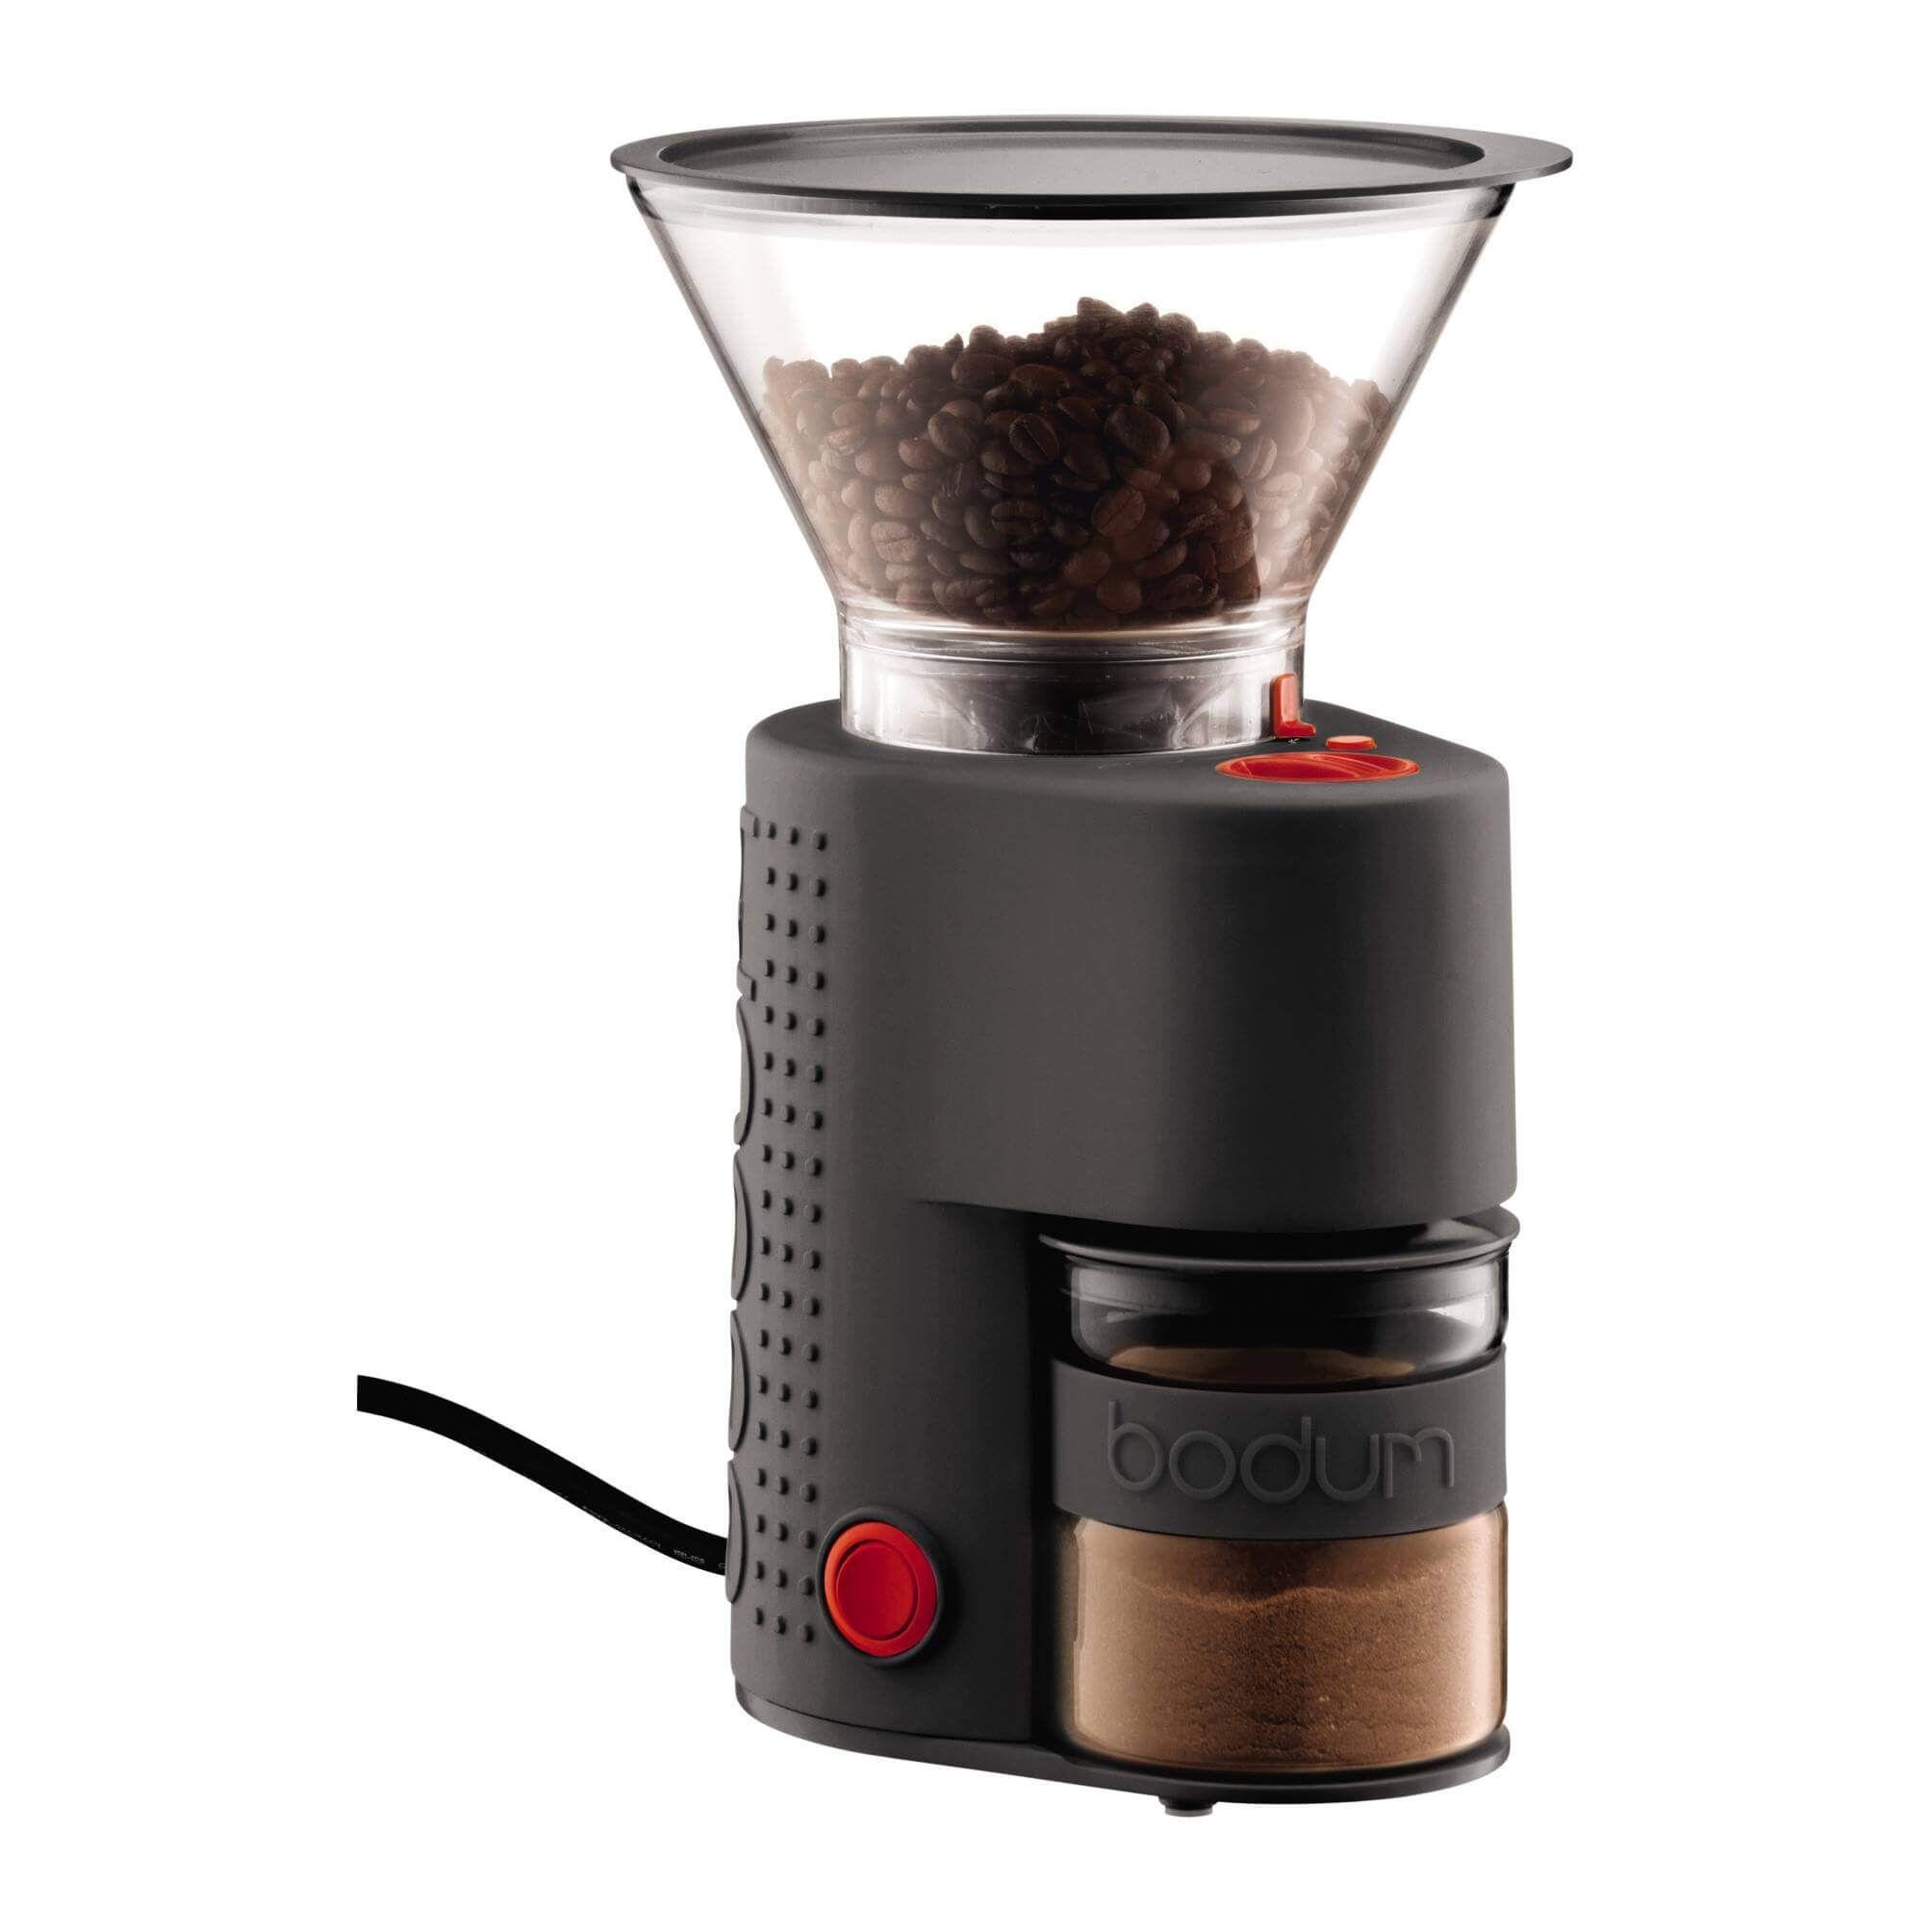 Breville pro smart coffee grinder pro review 2019 best